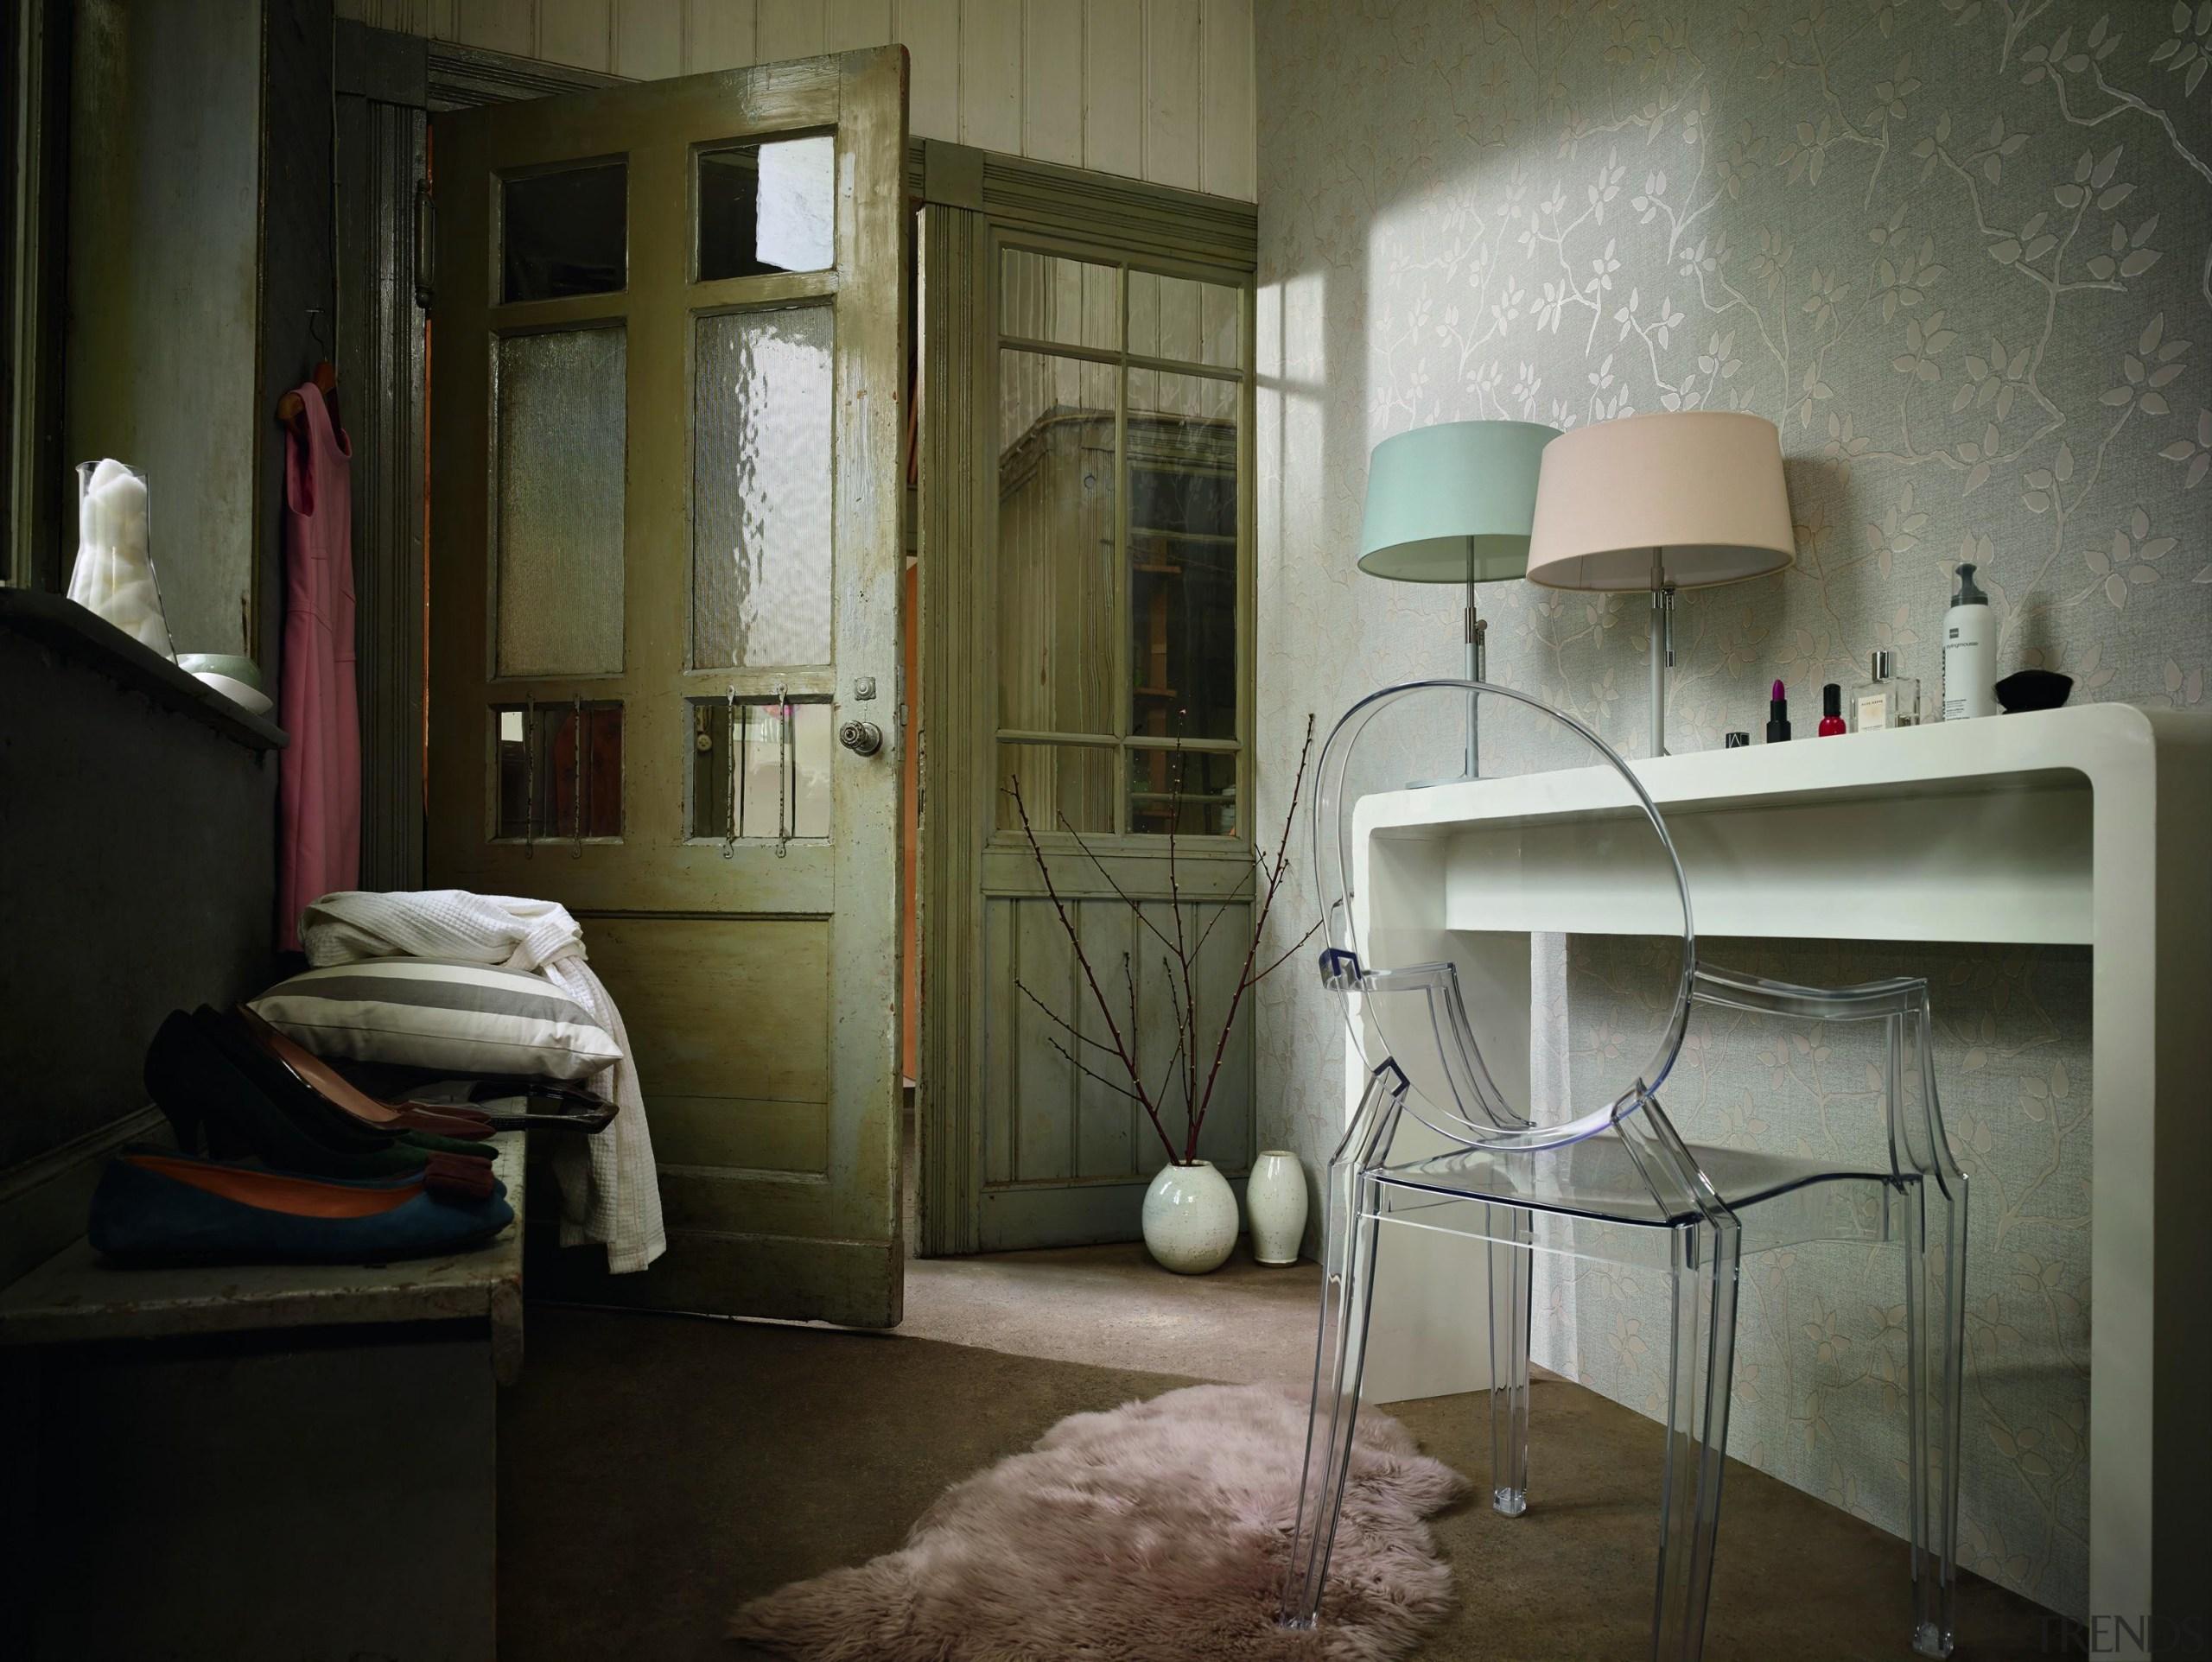 Elegance II Range - Elegance II Range - floor, furniture, home, interior design, room, table, wall, window, gray, brown